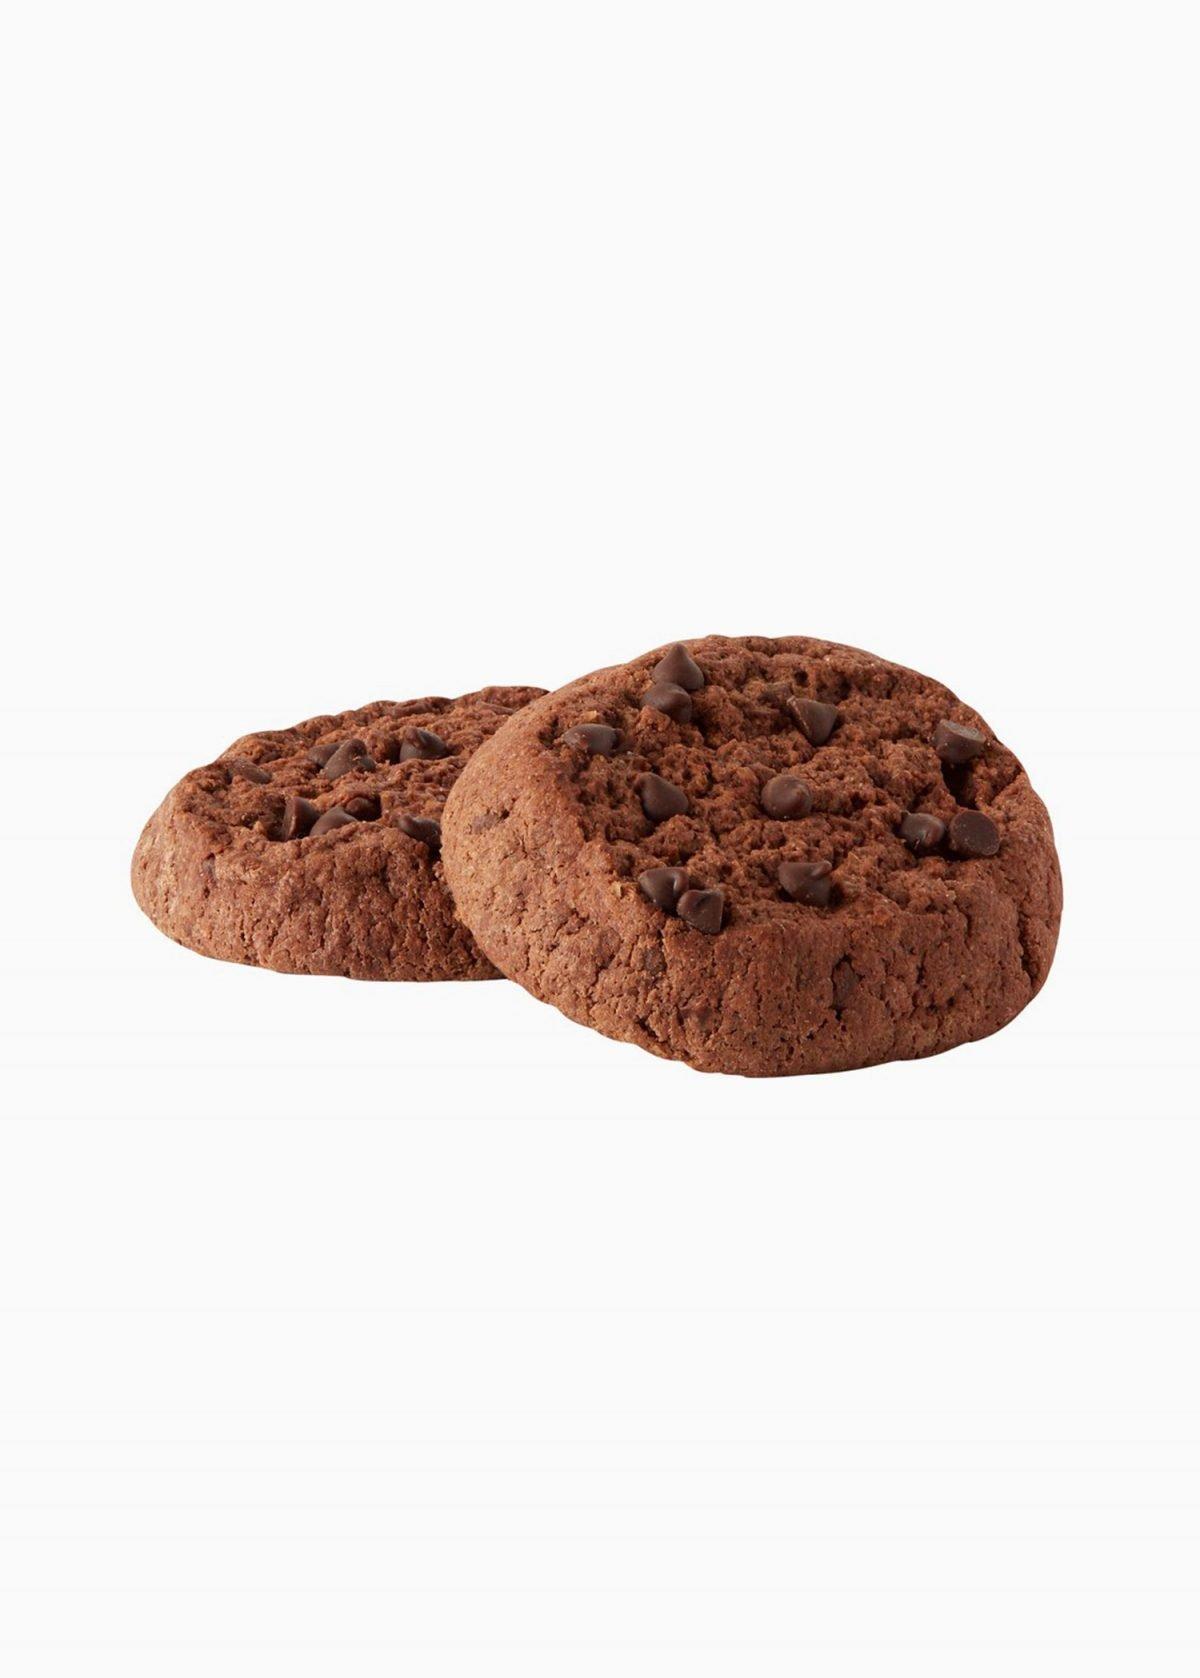 Aurora Drift Soft Baked Chocolate Cookies